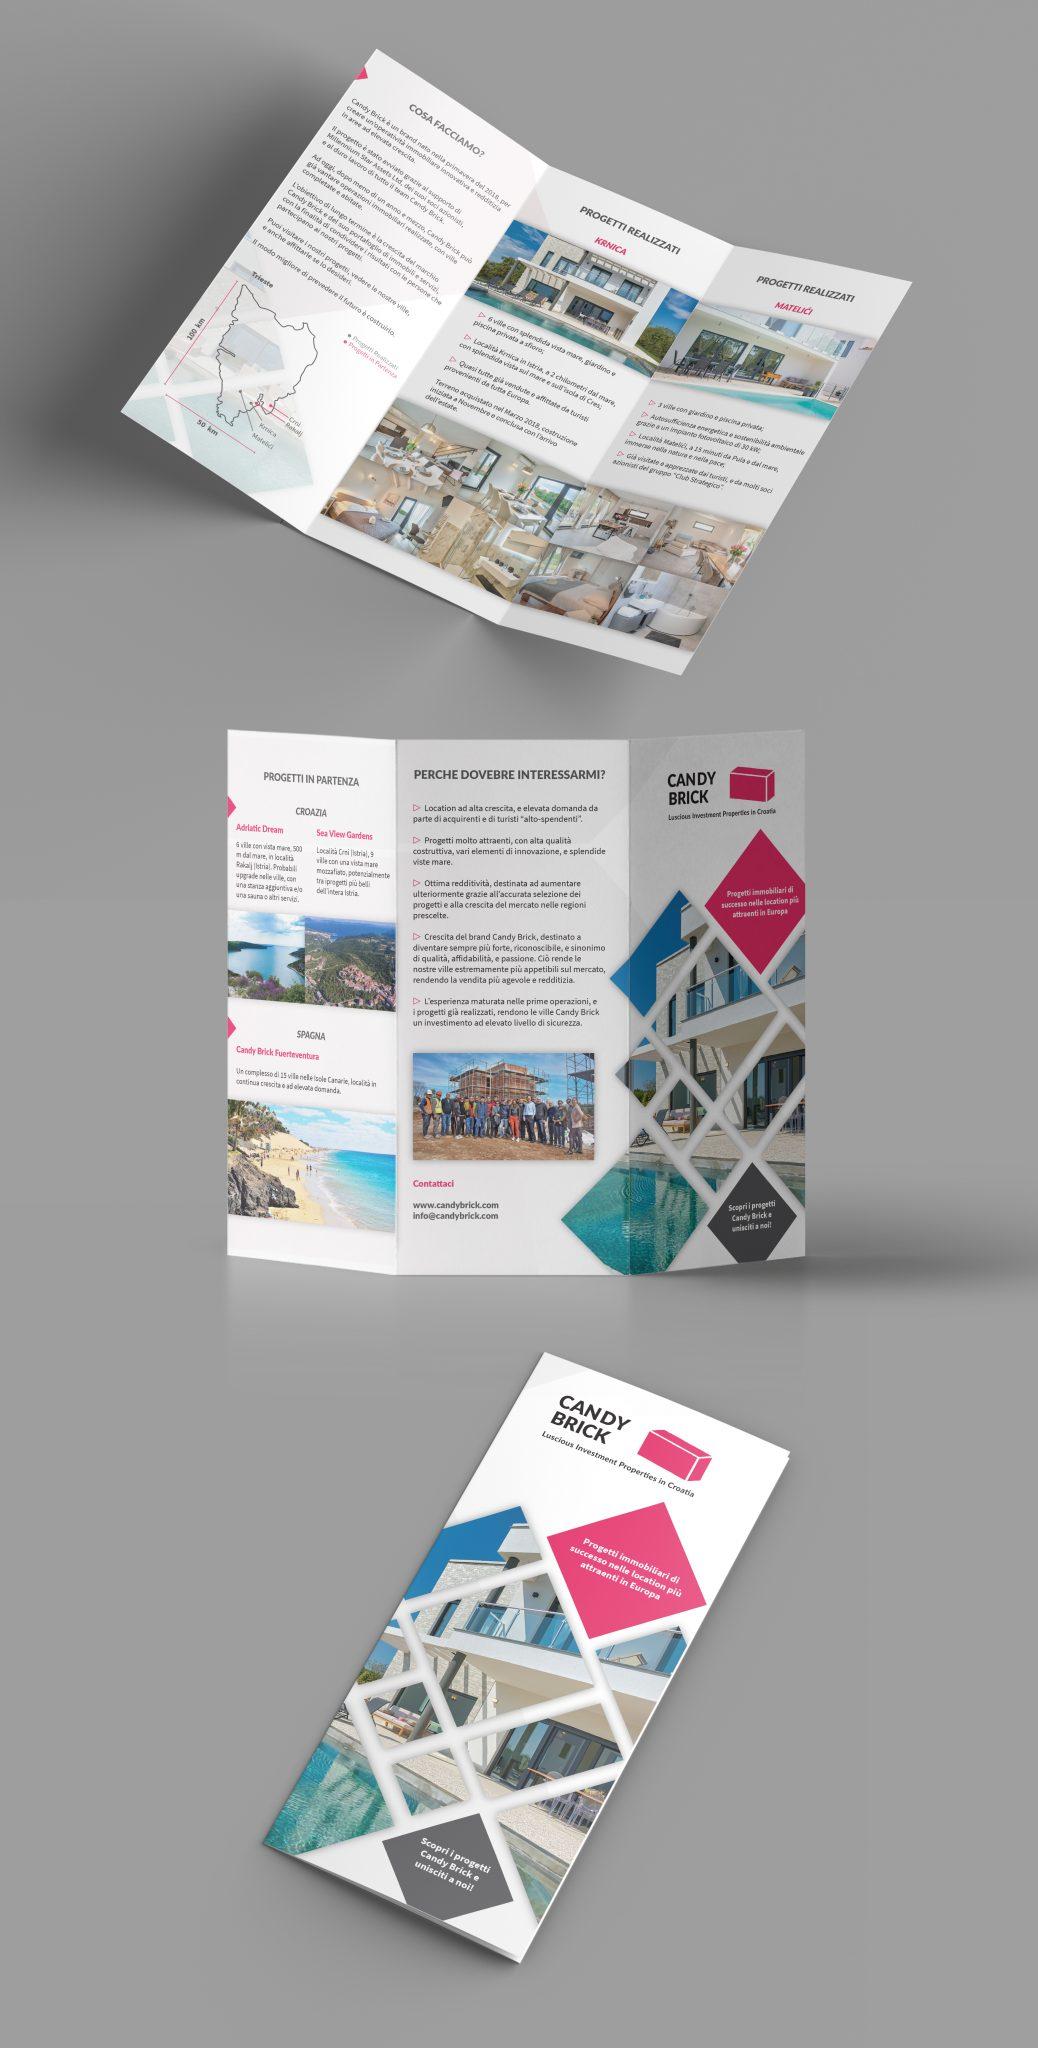 candy-brick-branding-event-brochure